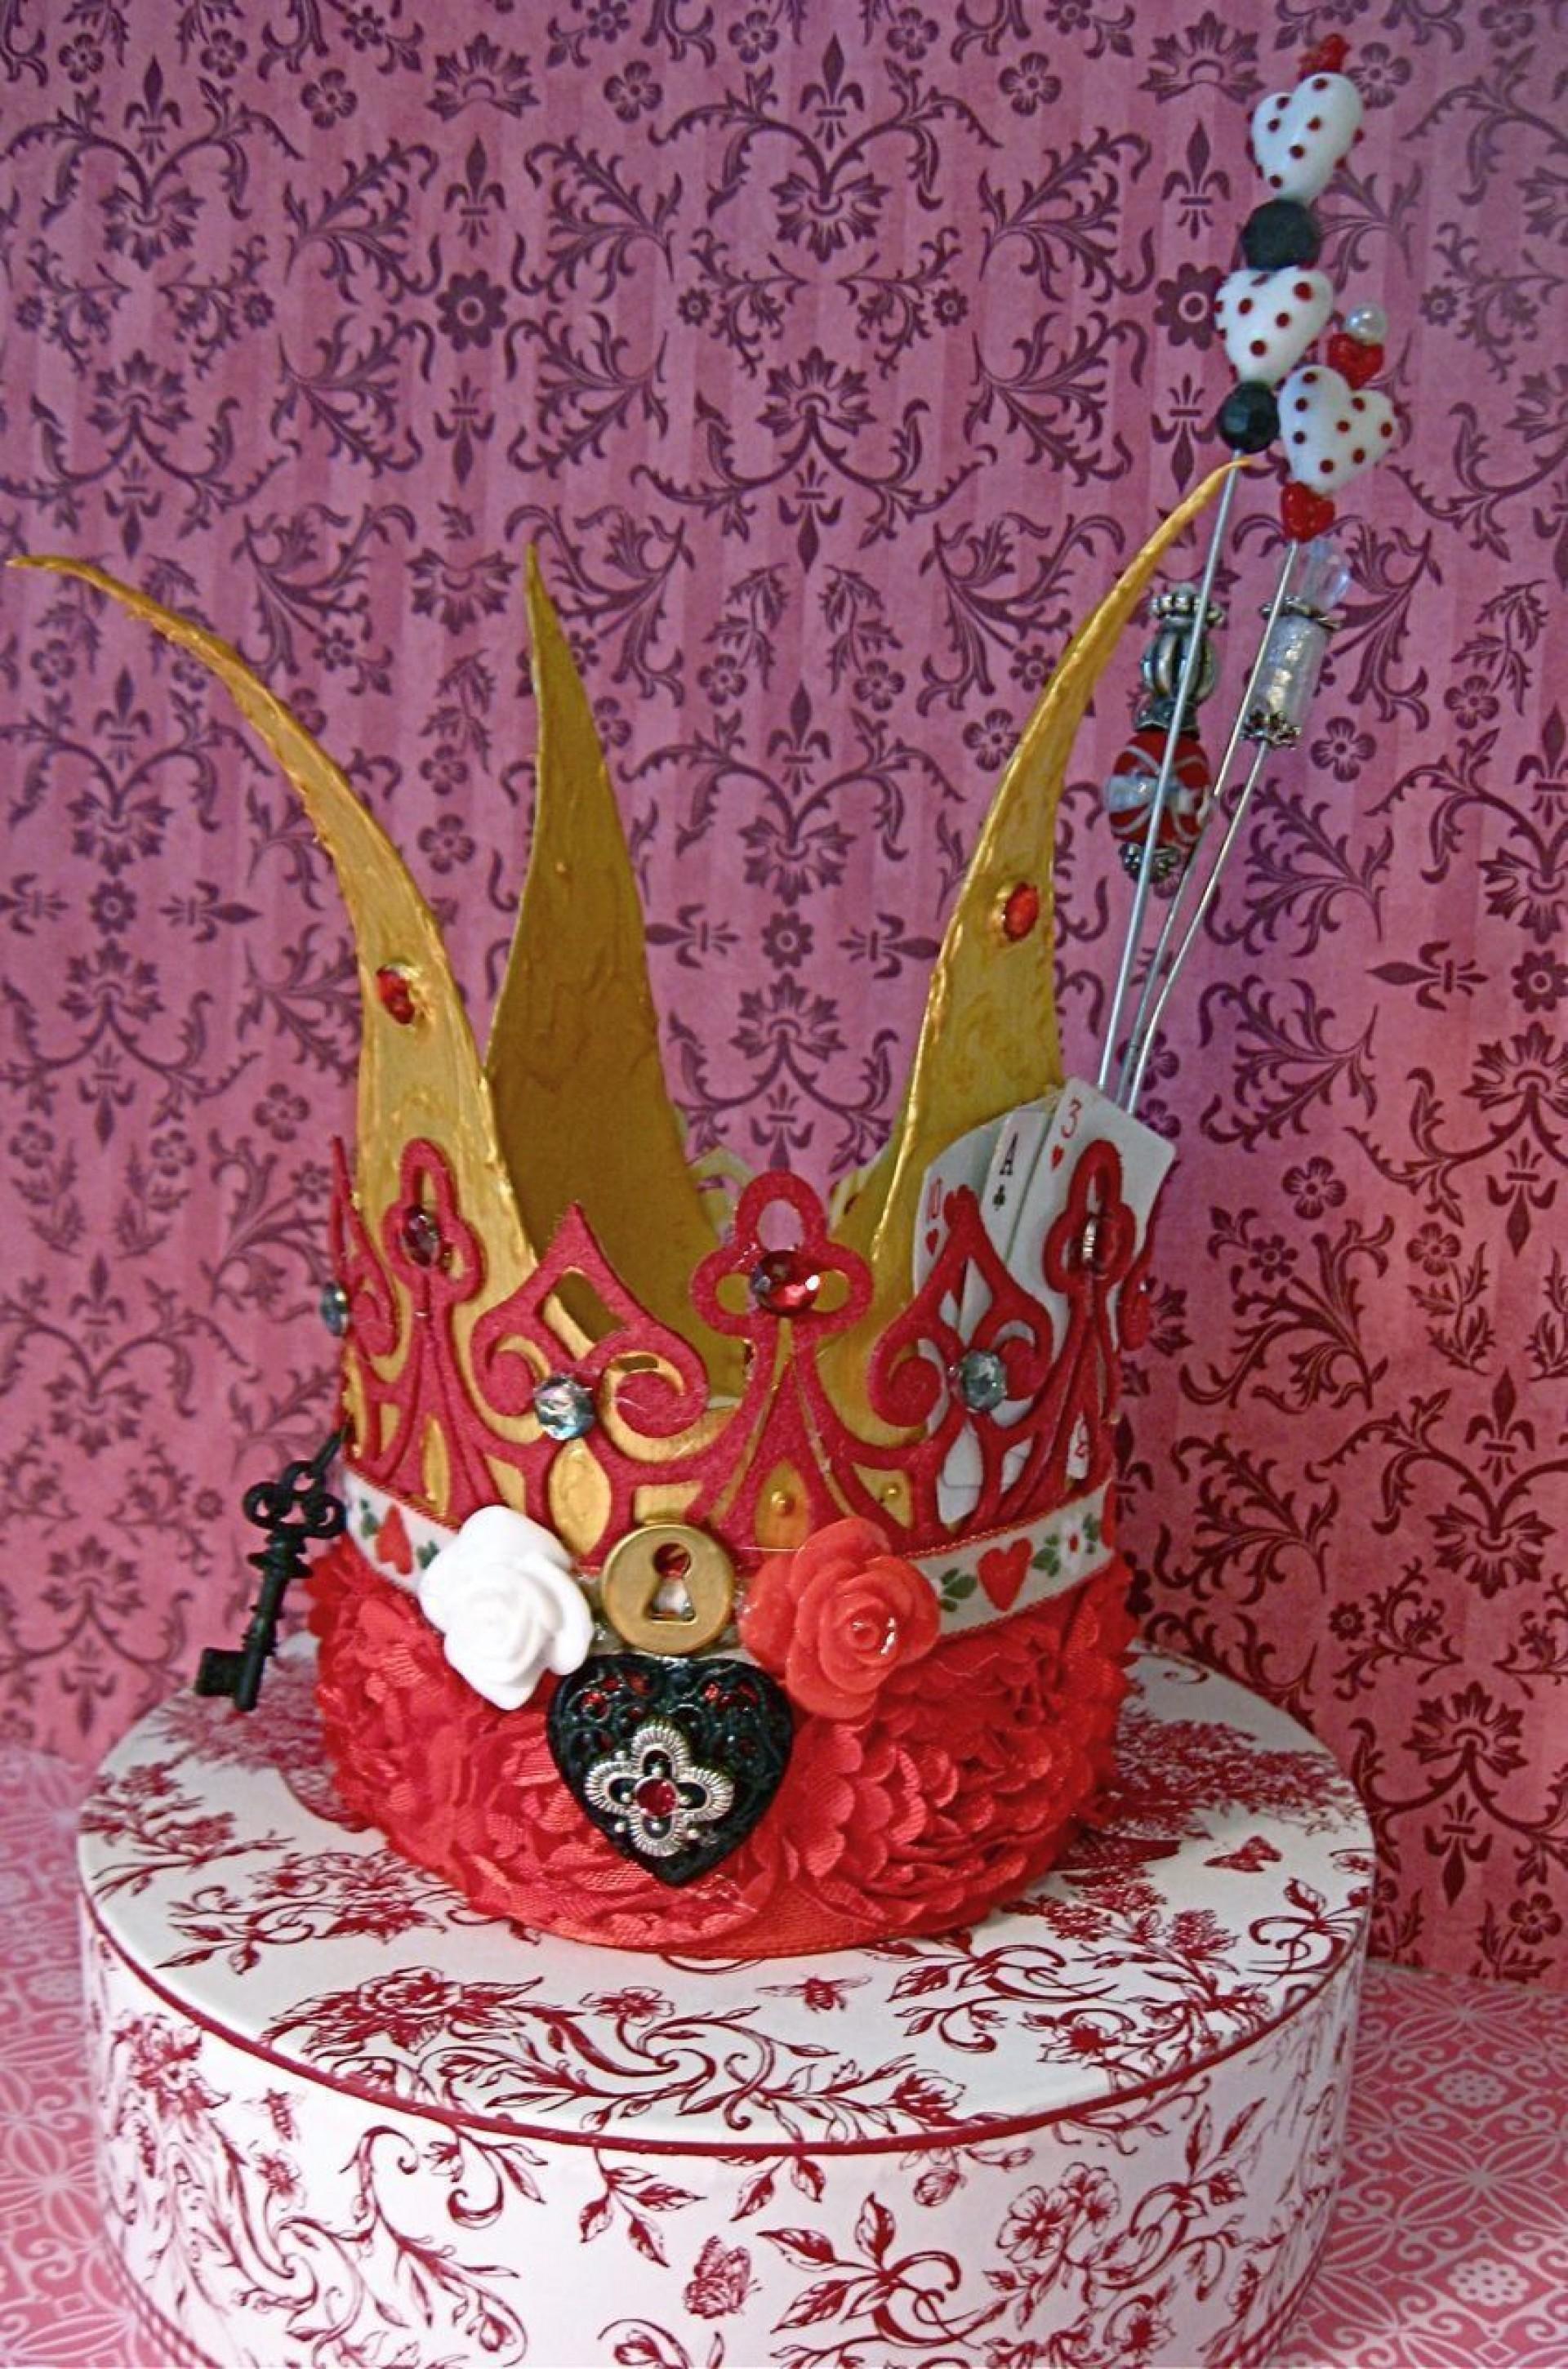 000 Stirring Queen Of Heart Crown Pattern Photo  Printable Template Headband Diy1920